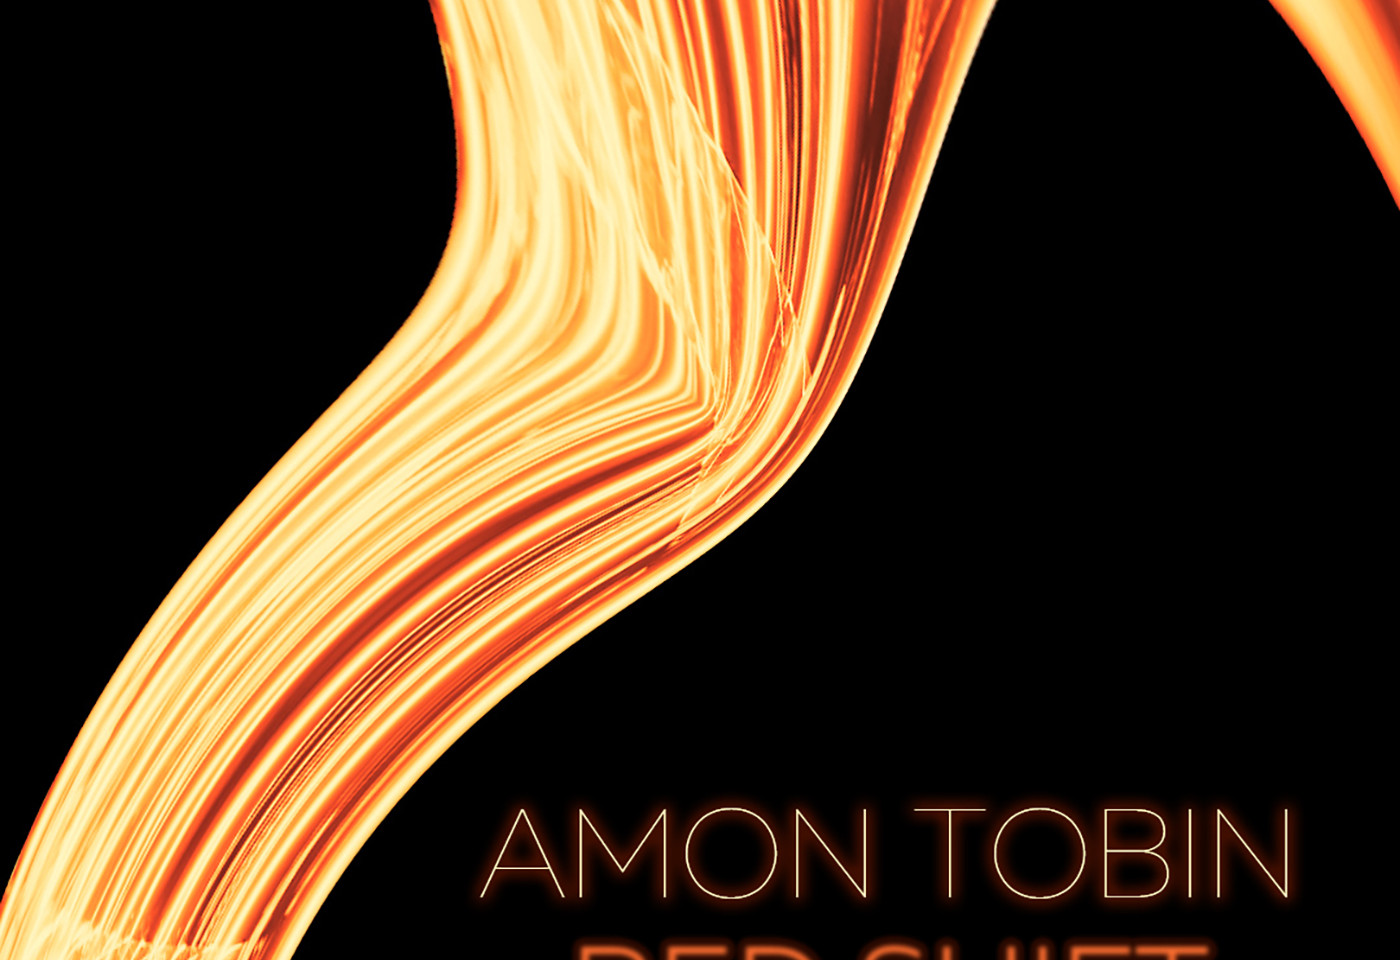 Amon Tobin - Red Shift